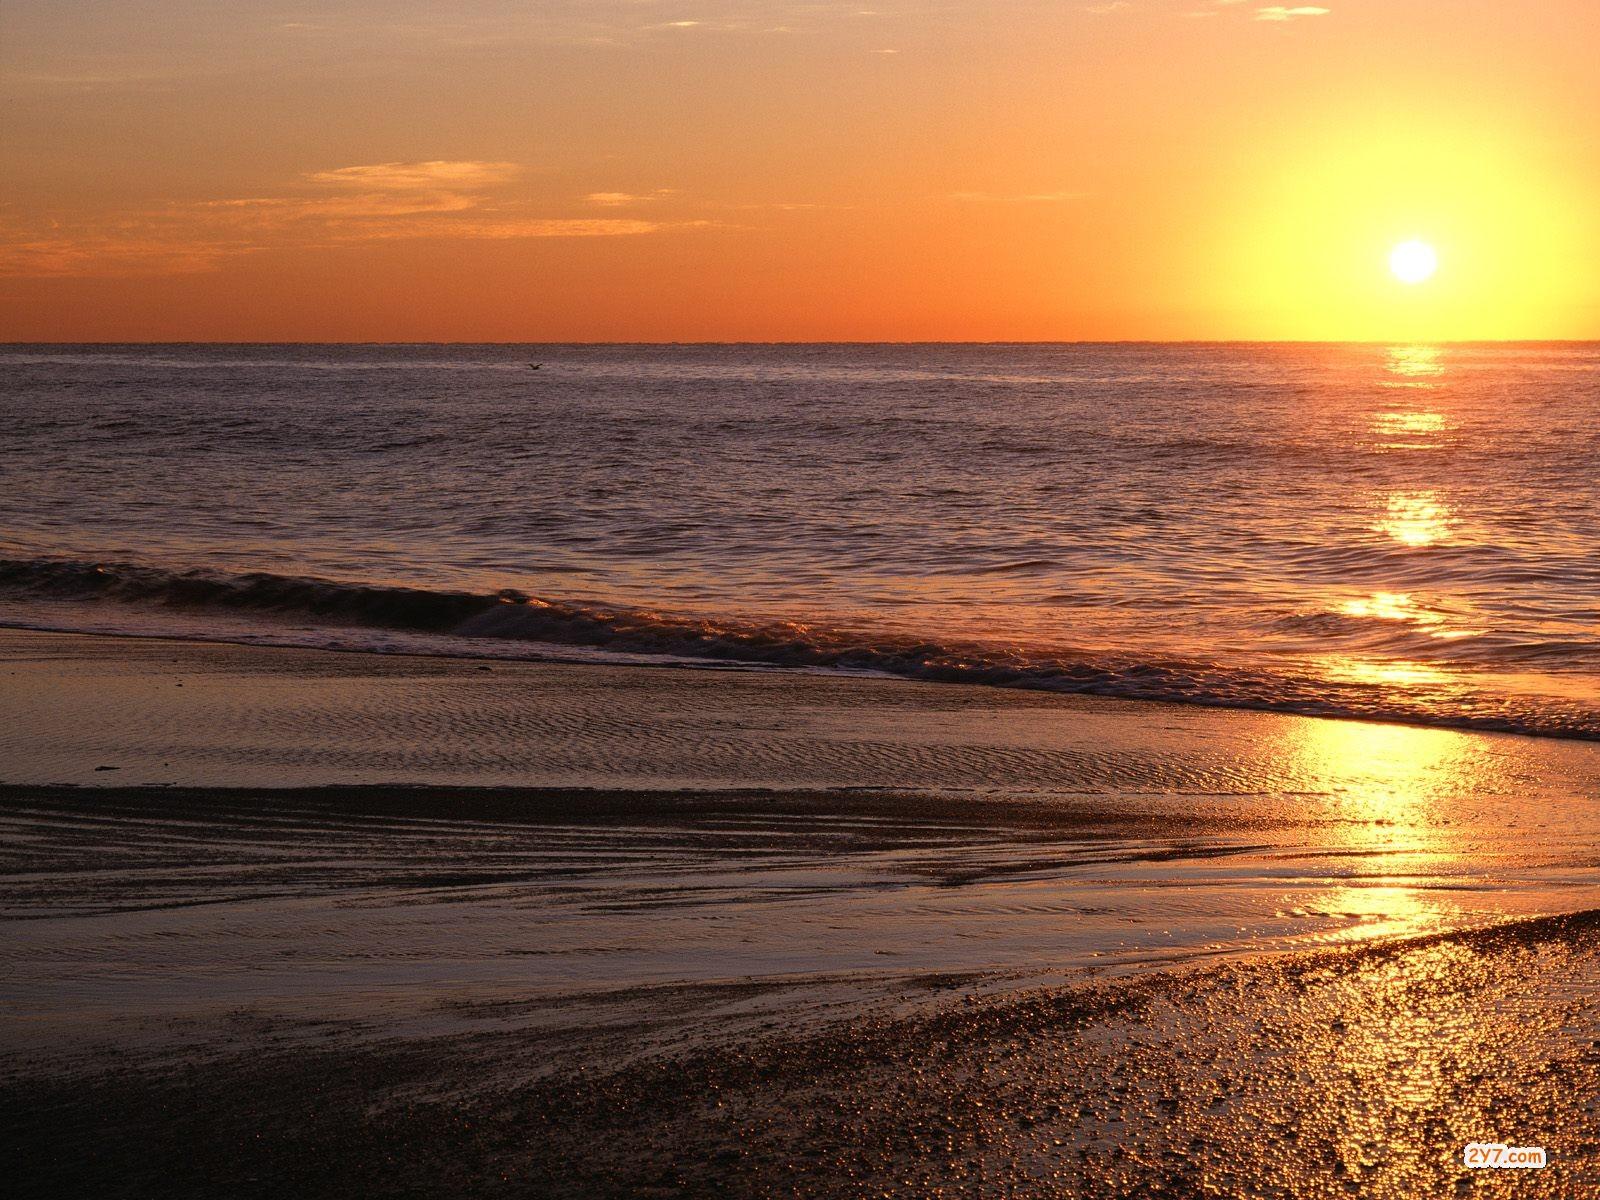 http://2.bp.blogspot.com/_nCZWejPVtpk/TQEy2IeK2UI/AAAAAAAAAPE/1-JKETTMZLQ/s1600/Sunrise-Over-the-Atlantic-Myrtle-Beach-South-C.jpg